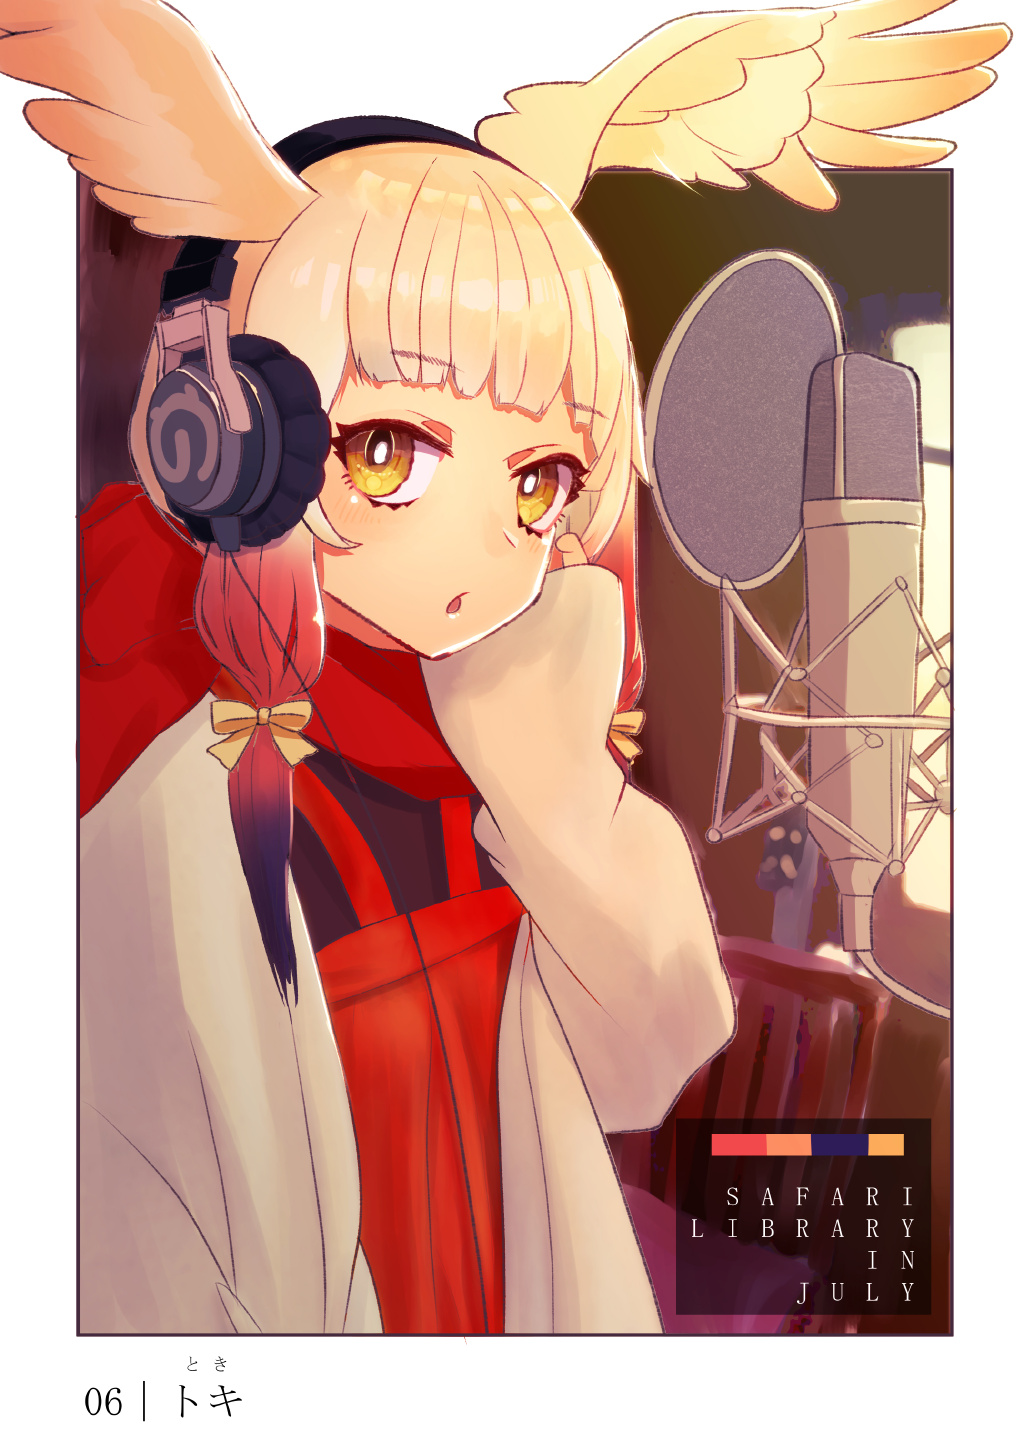 【P站画师】日本画师ポン汰的插画作品- ACG17.COM